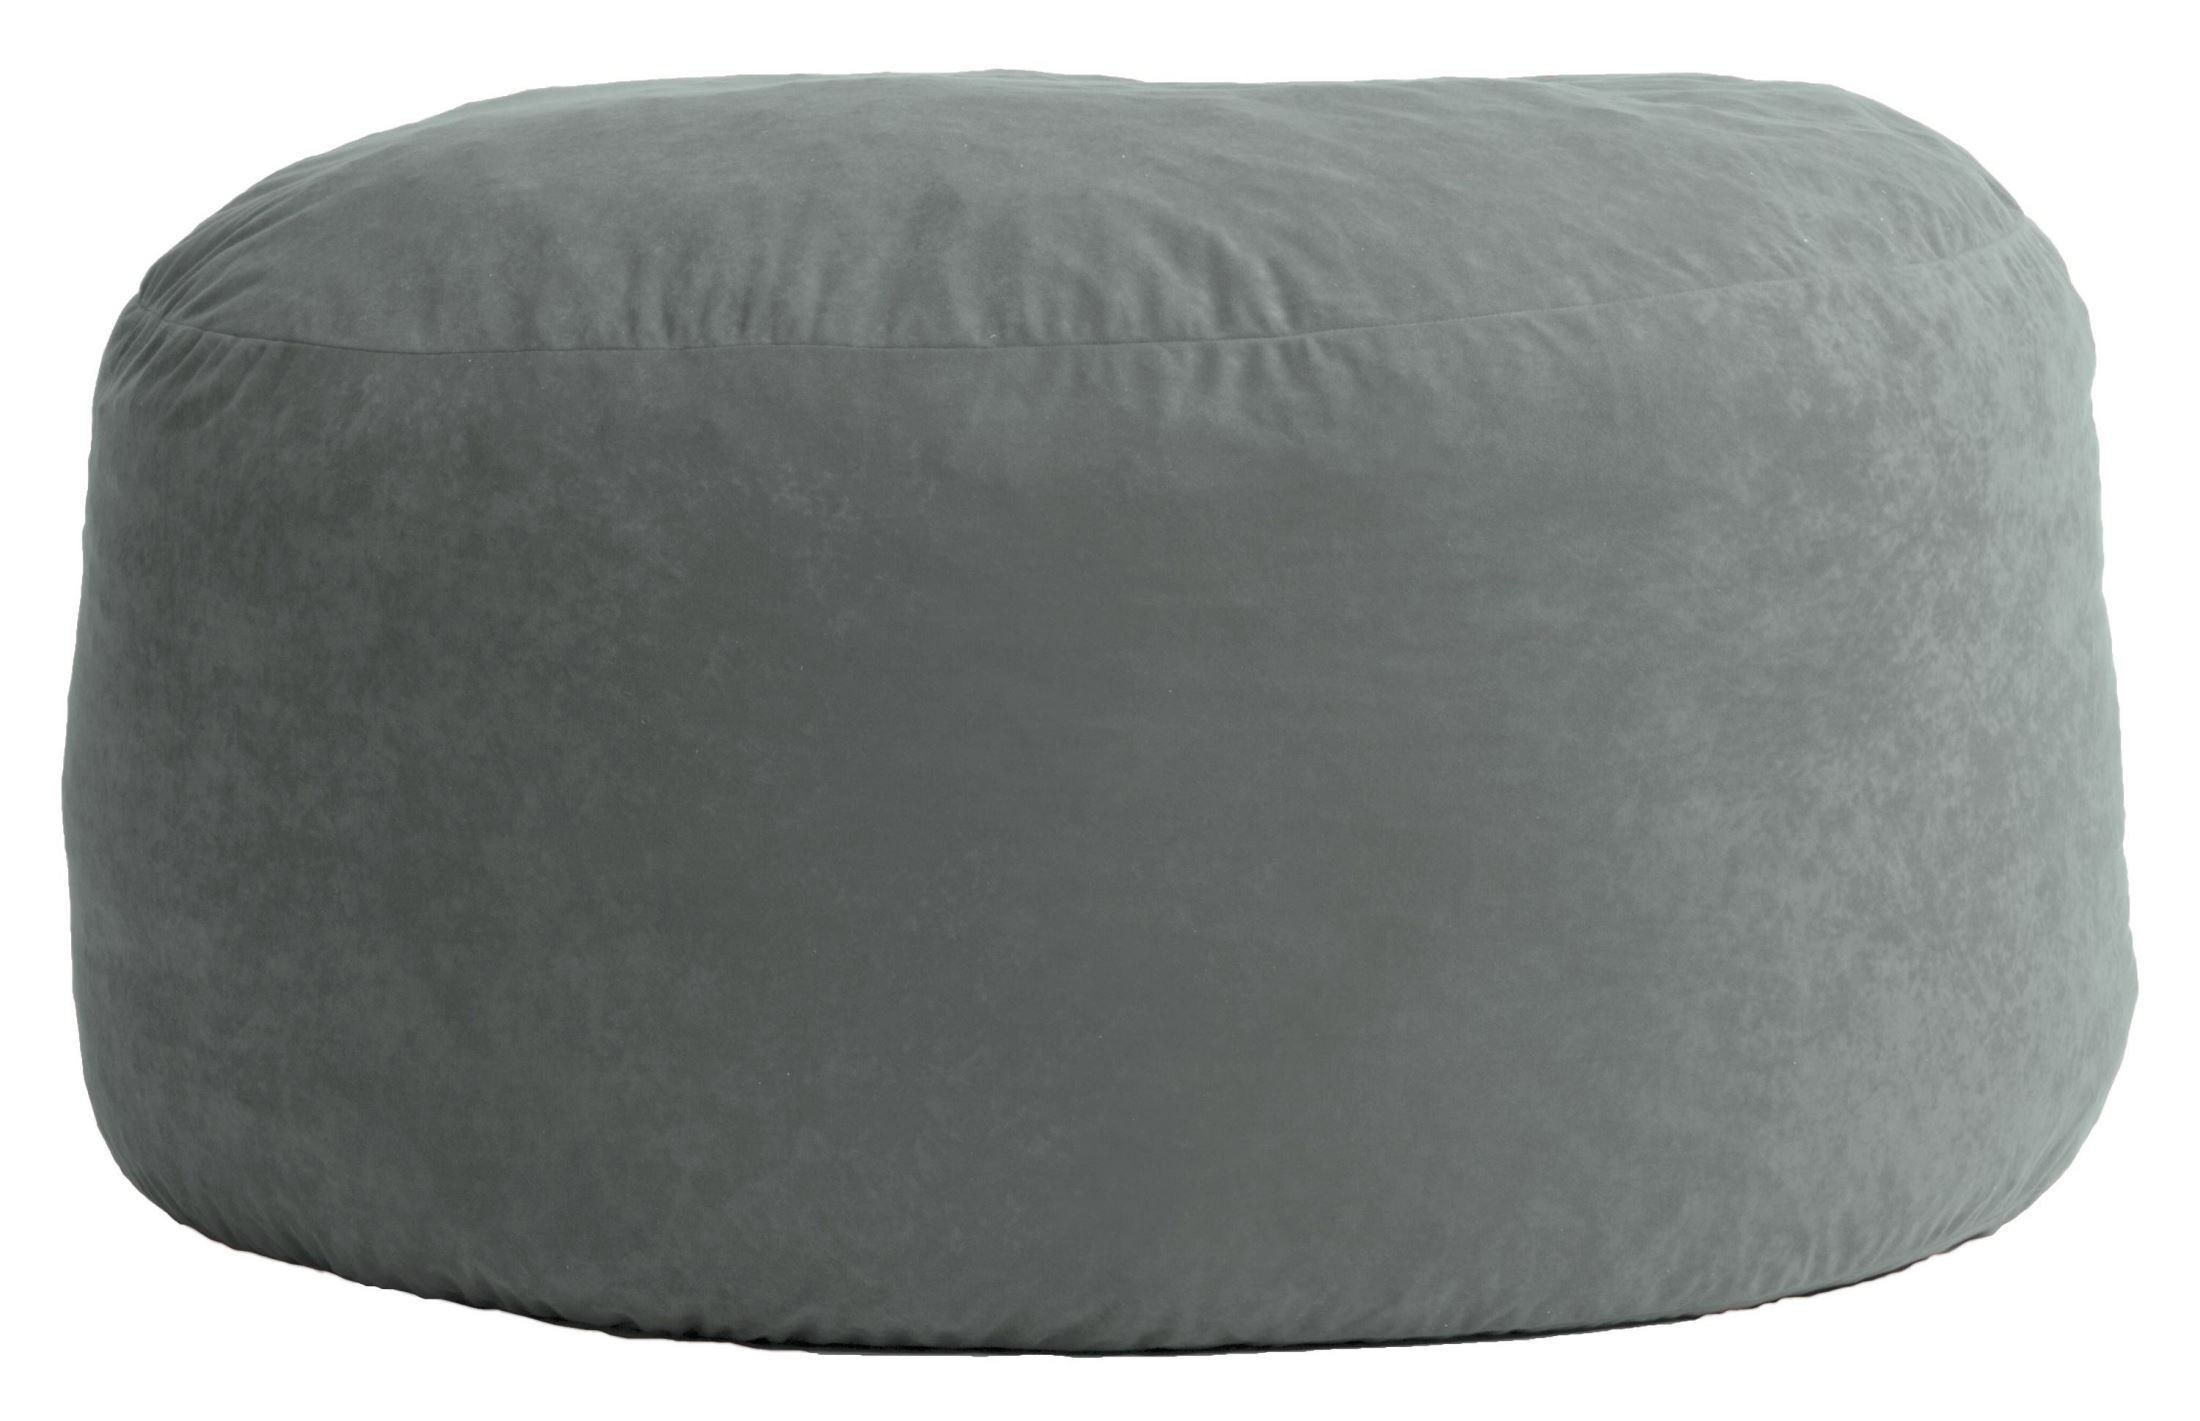 Big Joe Large Fuf Steel Grey Comfort Suede Bean Bag From